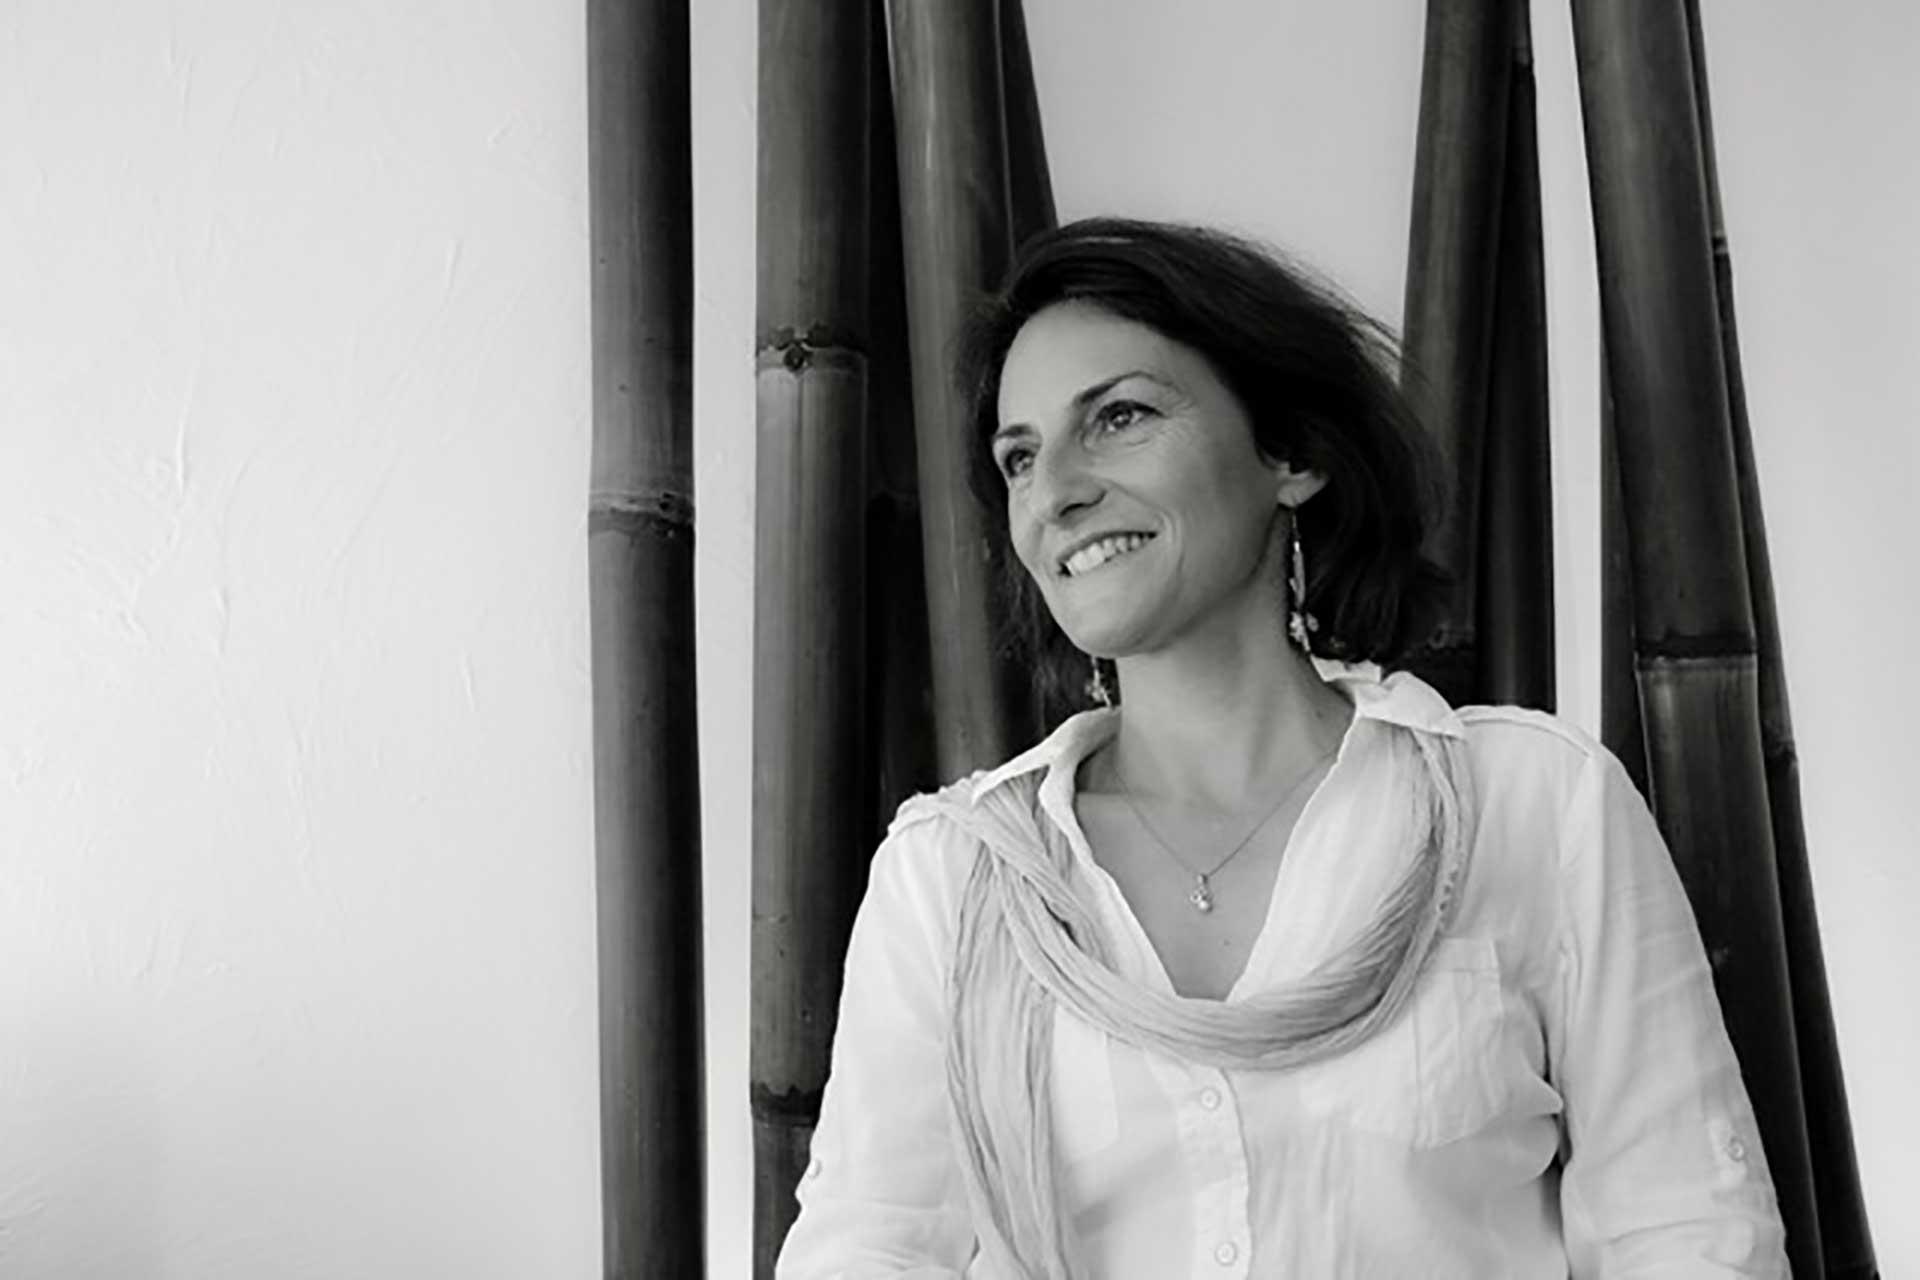 La-Sophro-Nathalie-Moyne-Accueil-Sophrologie-Sophrologue-Portrait